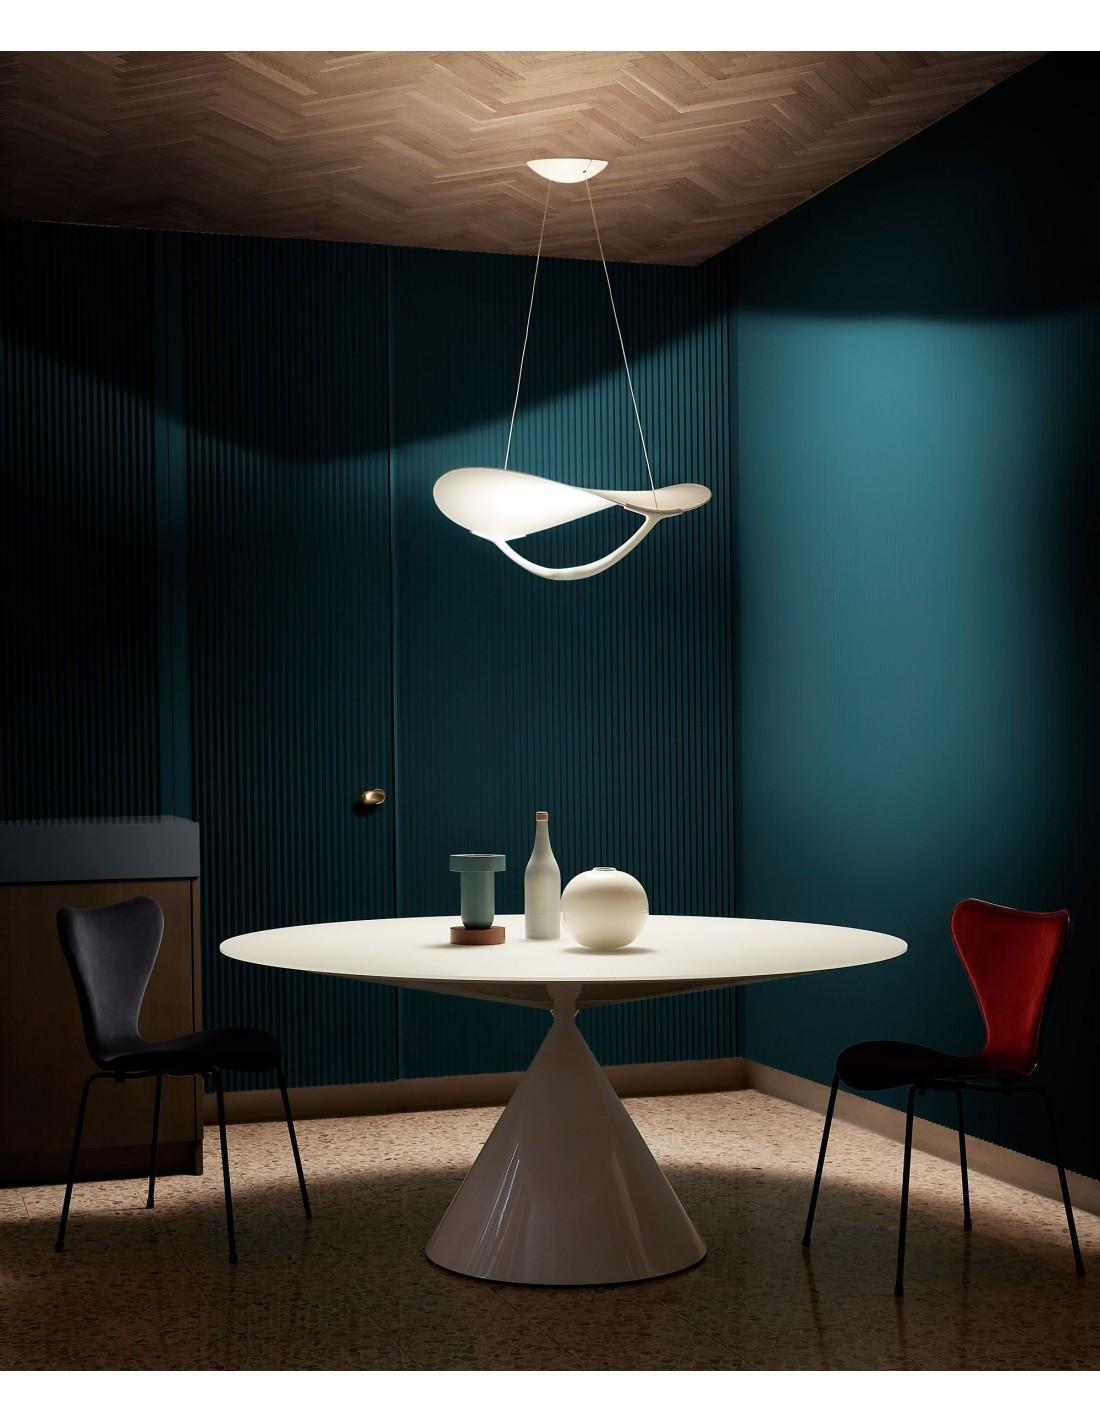 Suspension Plena mise en scéne éclairée - Foscarini - Valente Design